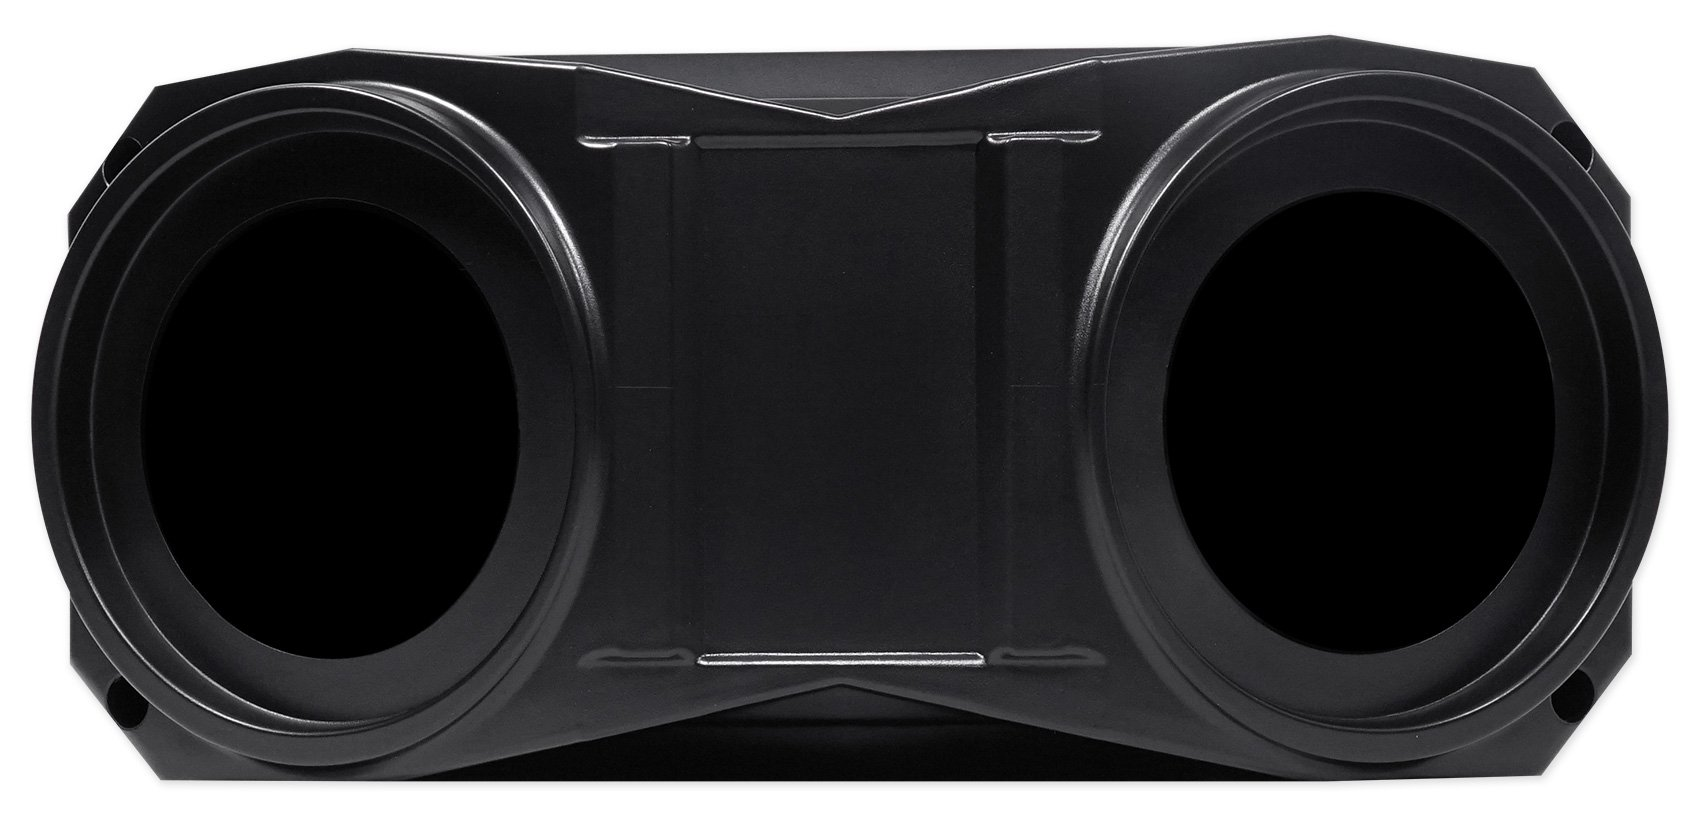 Metra OH-DIN01 6.5'' Overhead Speaker+Receiver Enclosure Polaris RZR/ATV/UTV/Cart by Metra (Image #1)